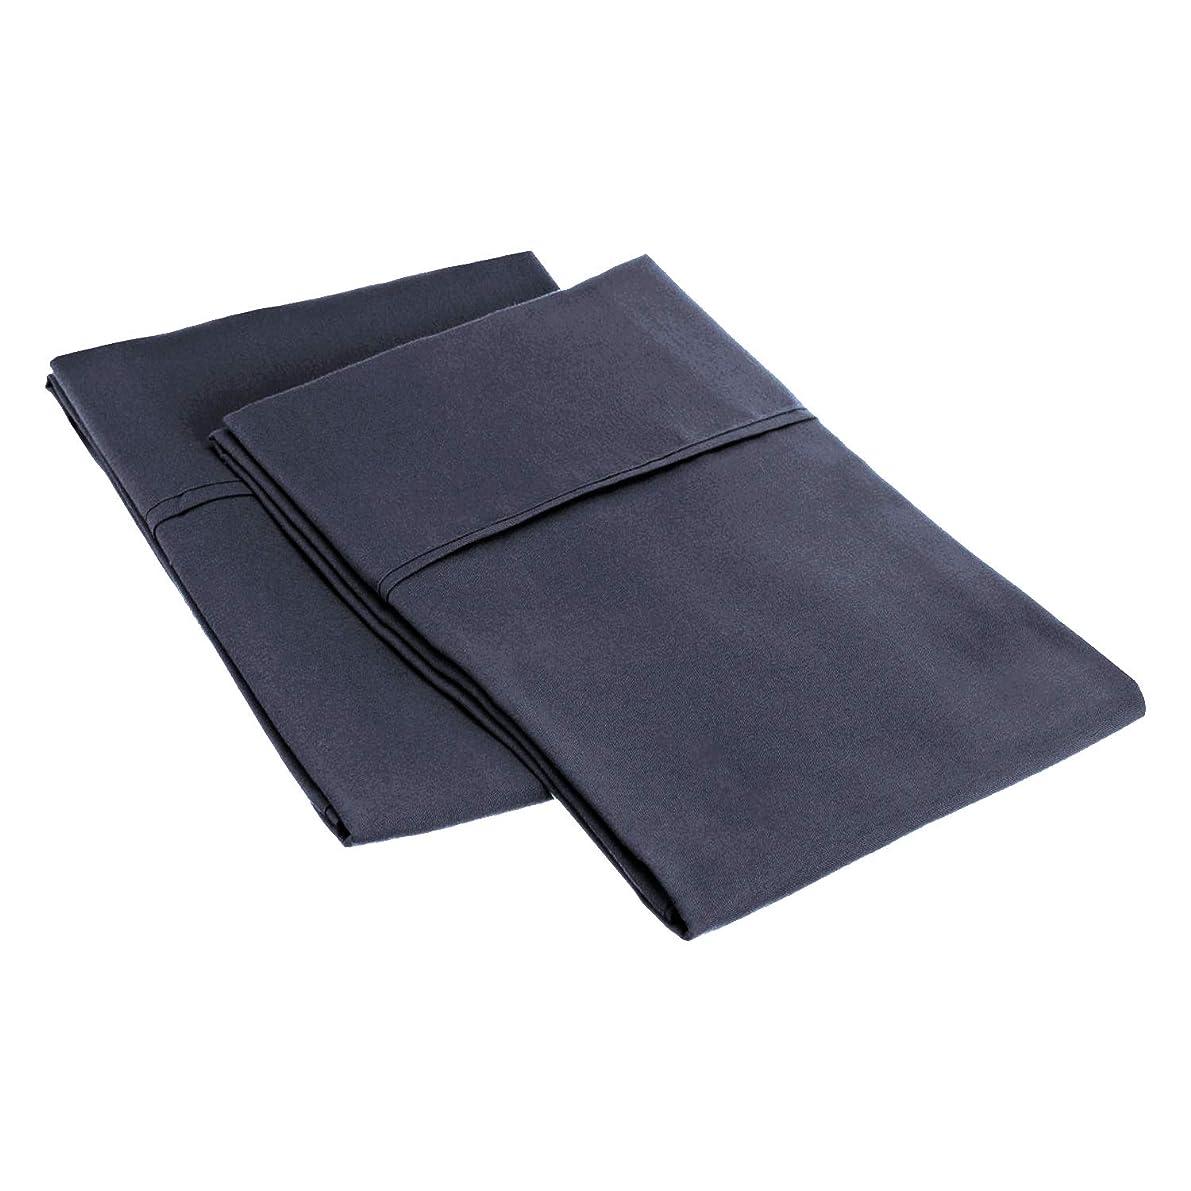 Superior 1500 Series 100% Brushed Microfiber Pillowcase Set of 2, Standard, Navy Blue